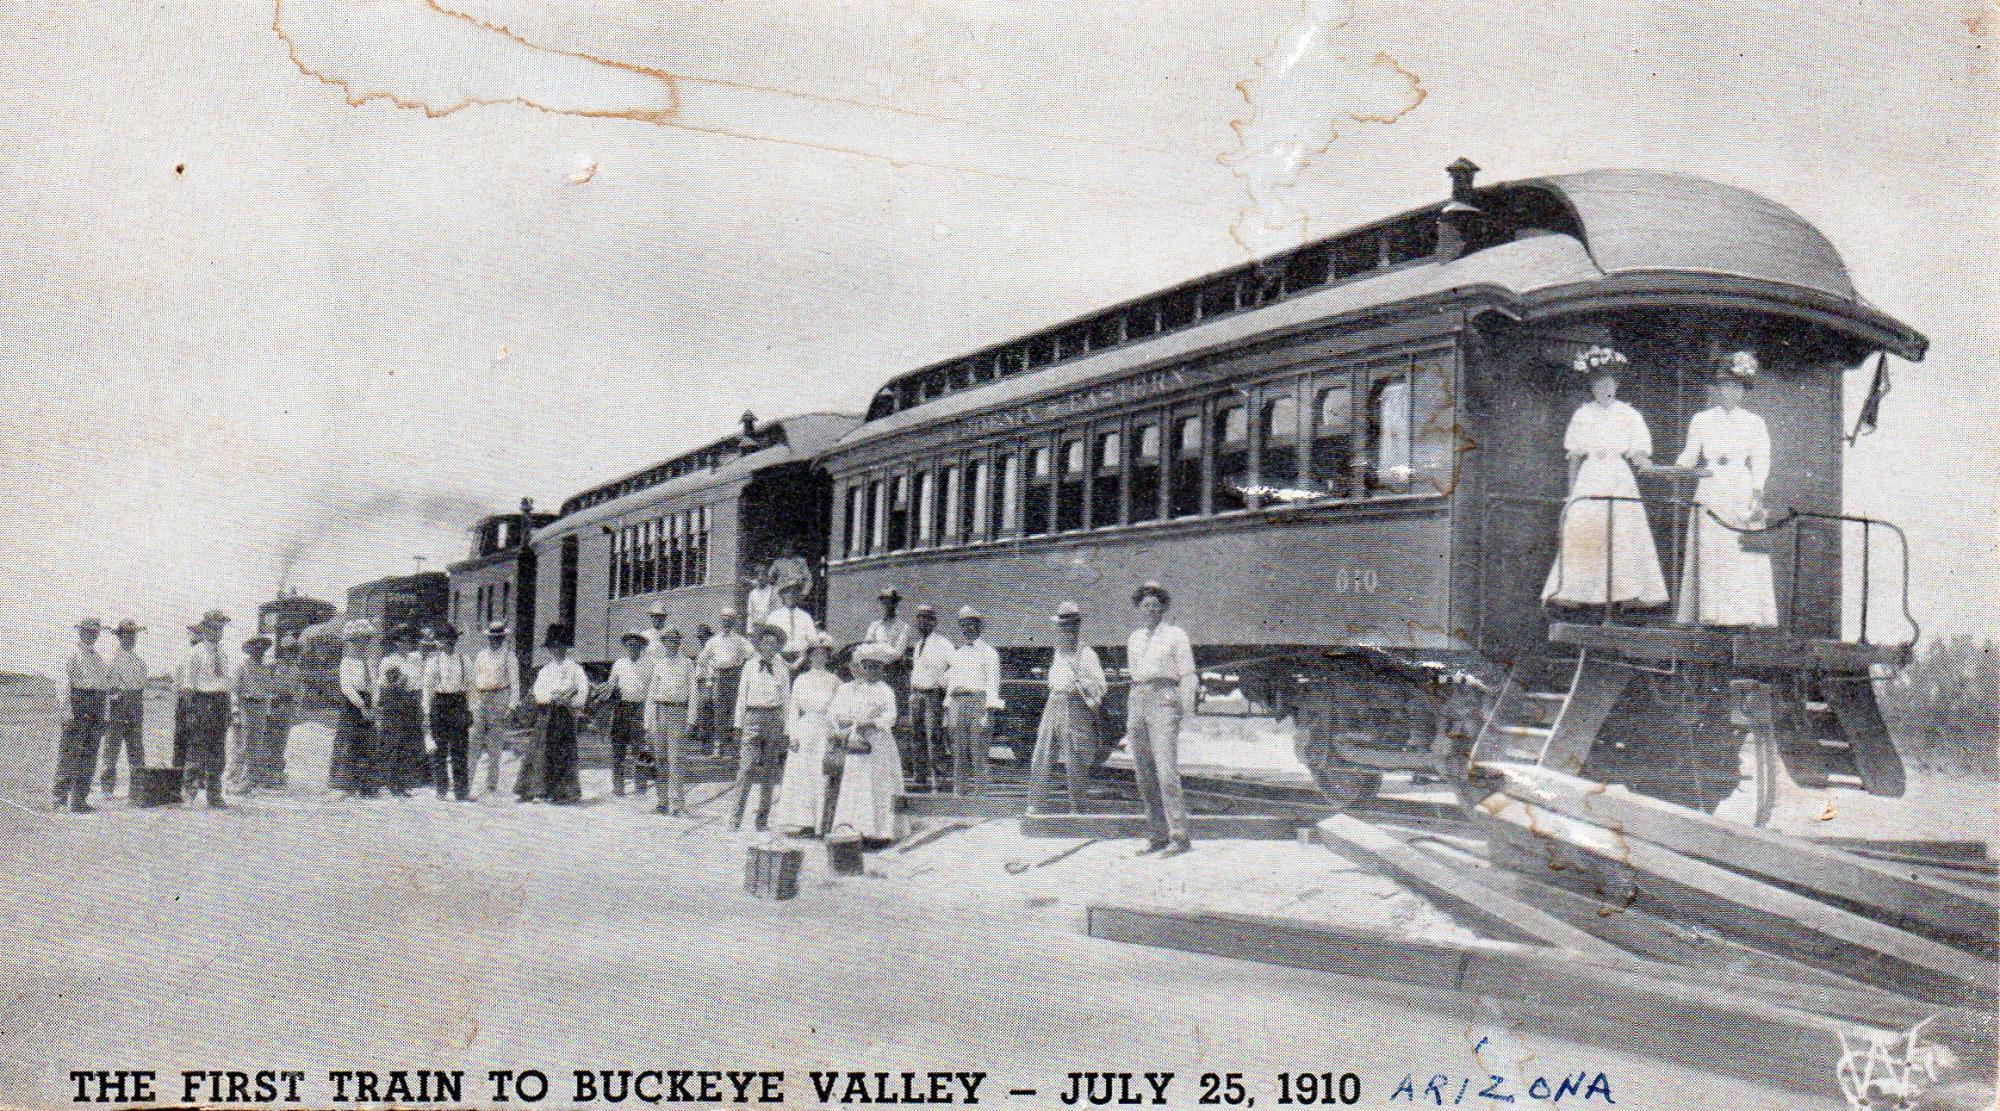 First Train to Buckeye Valley, Arizona